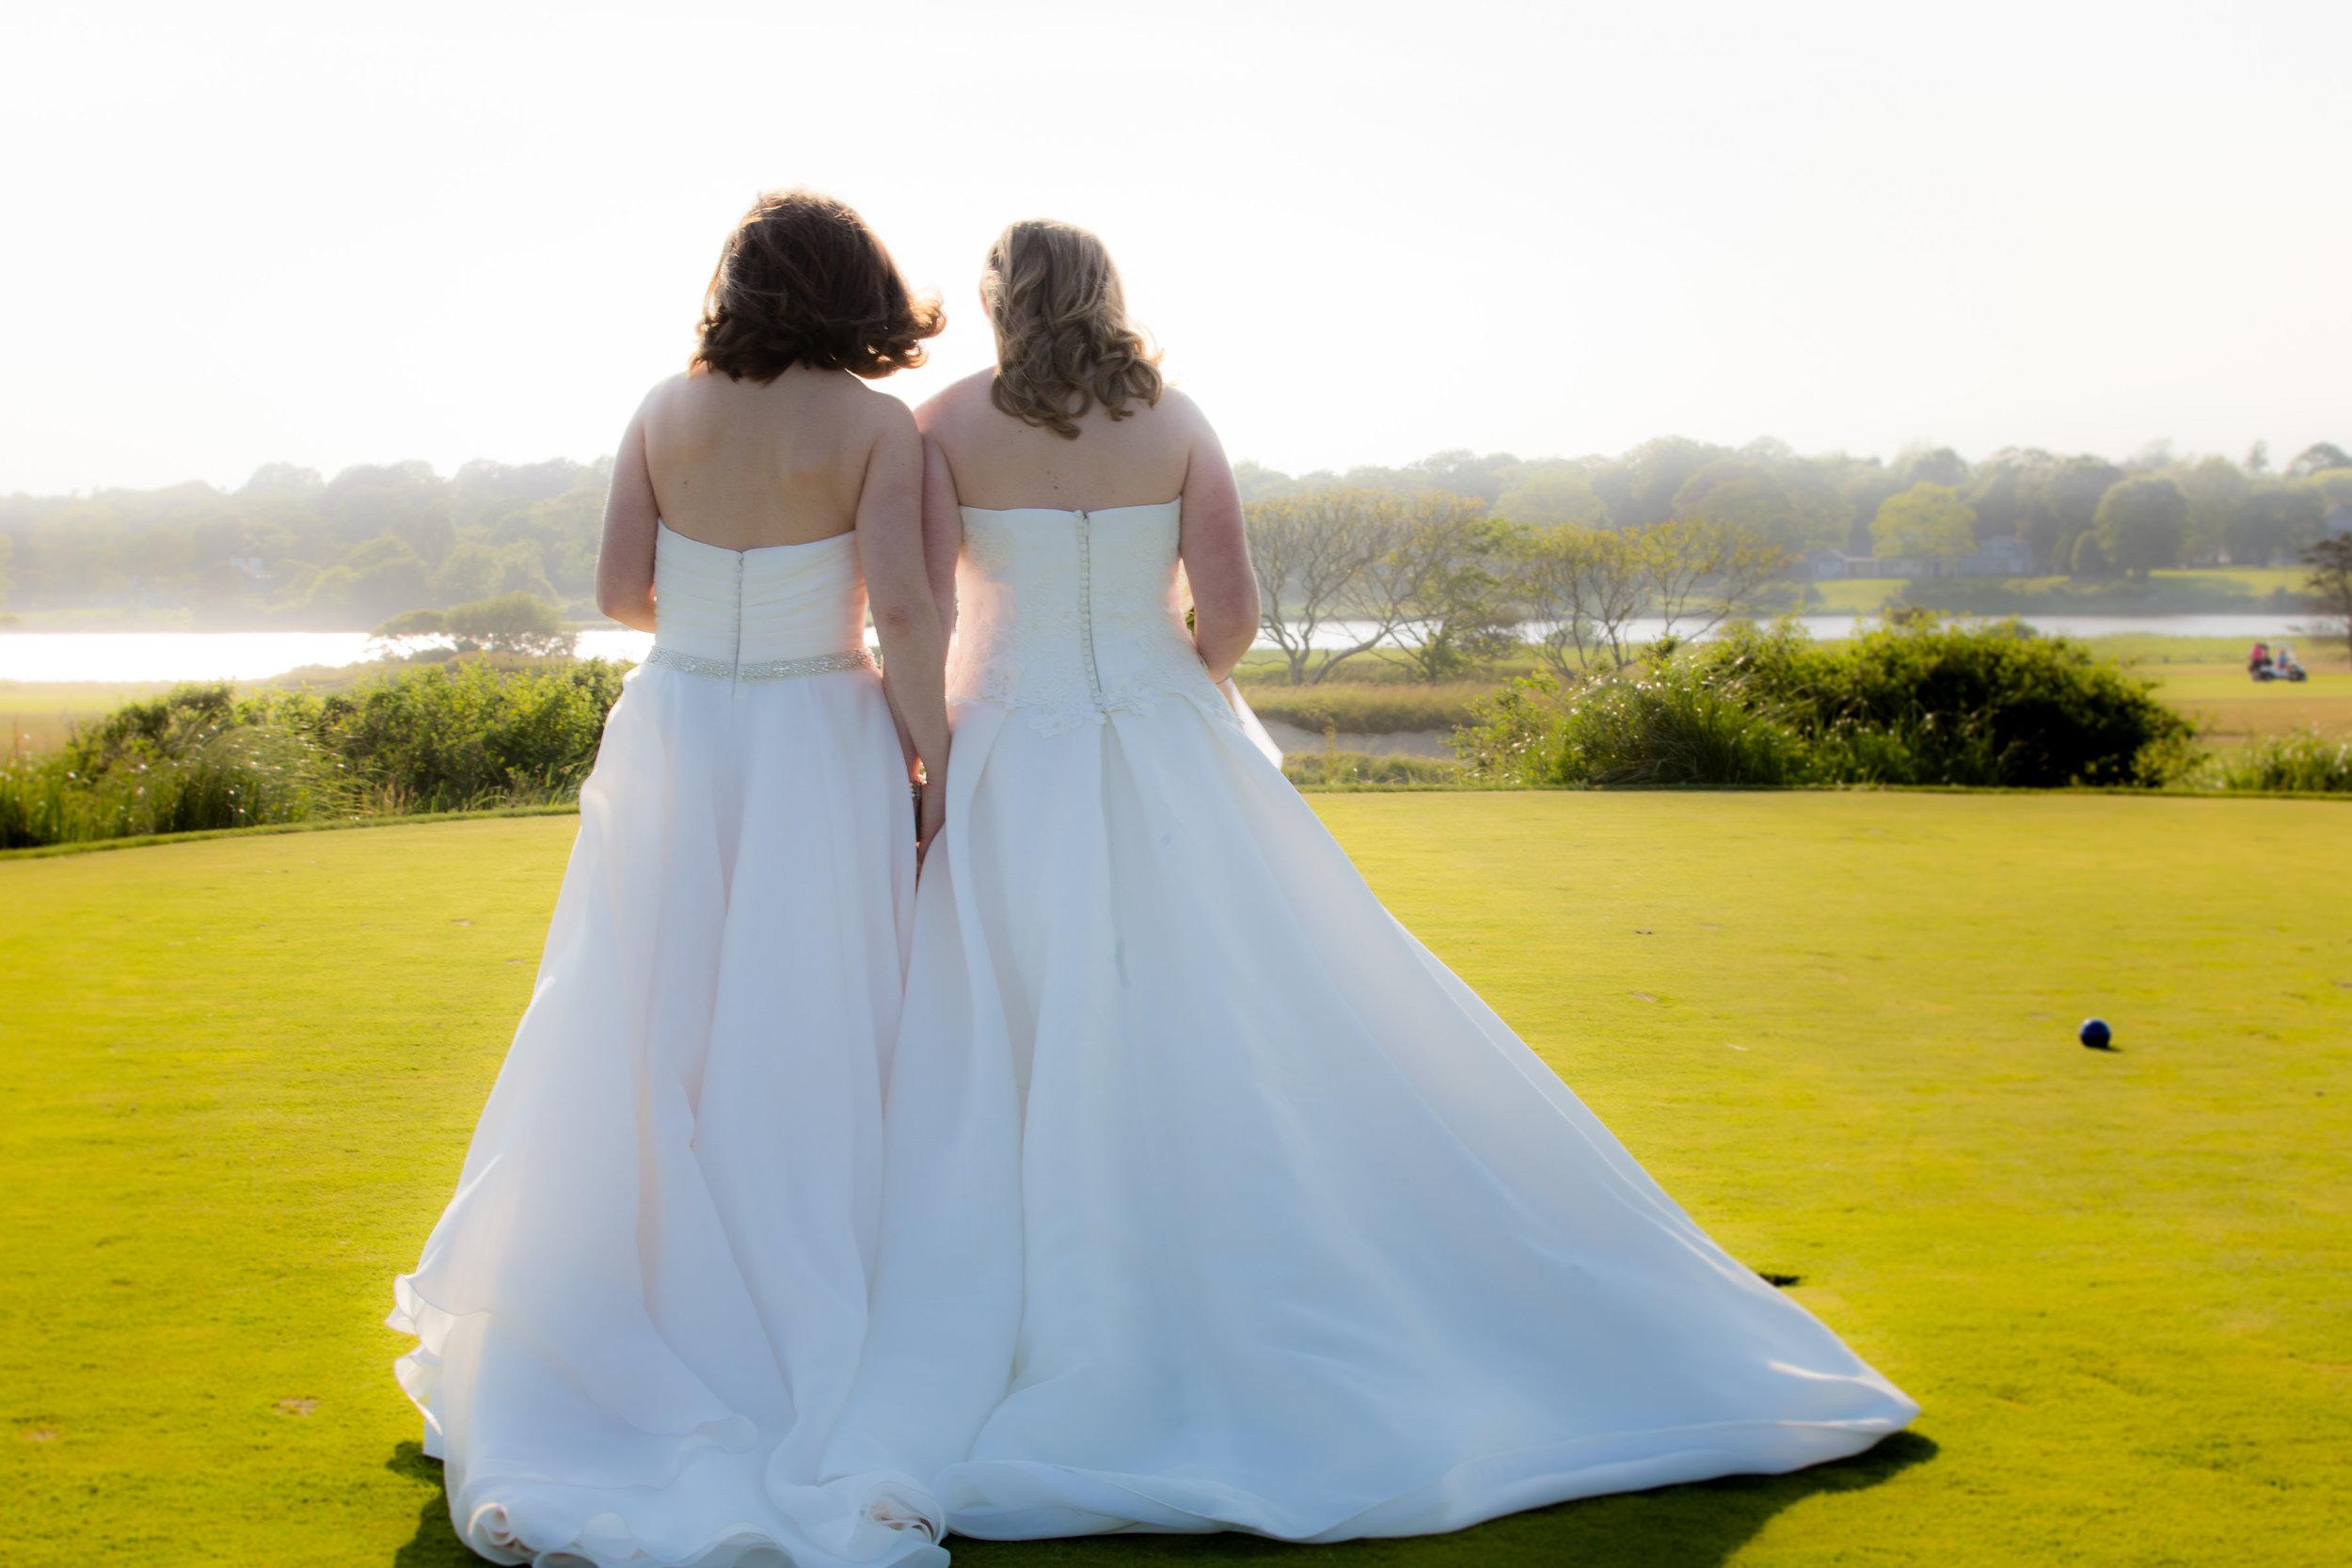 4-eyes-photography-the-maidstone-club-wedding-0425.jpg